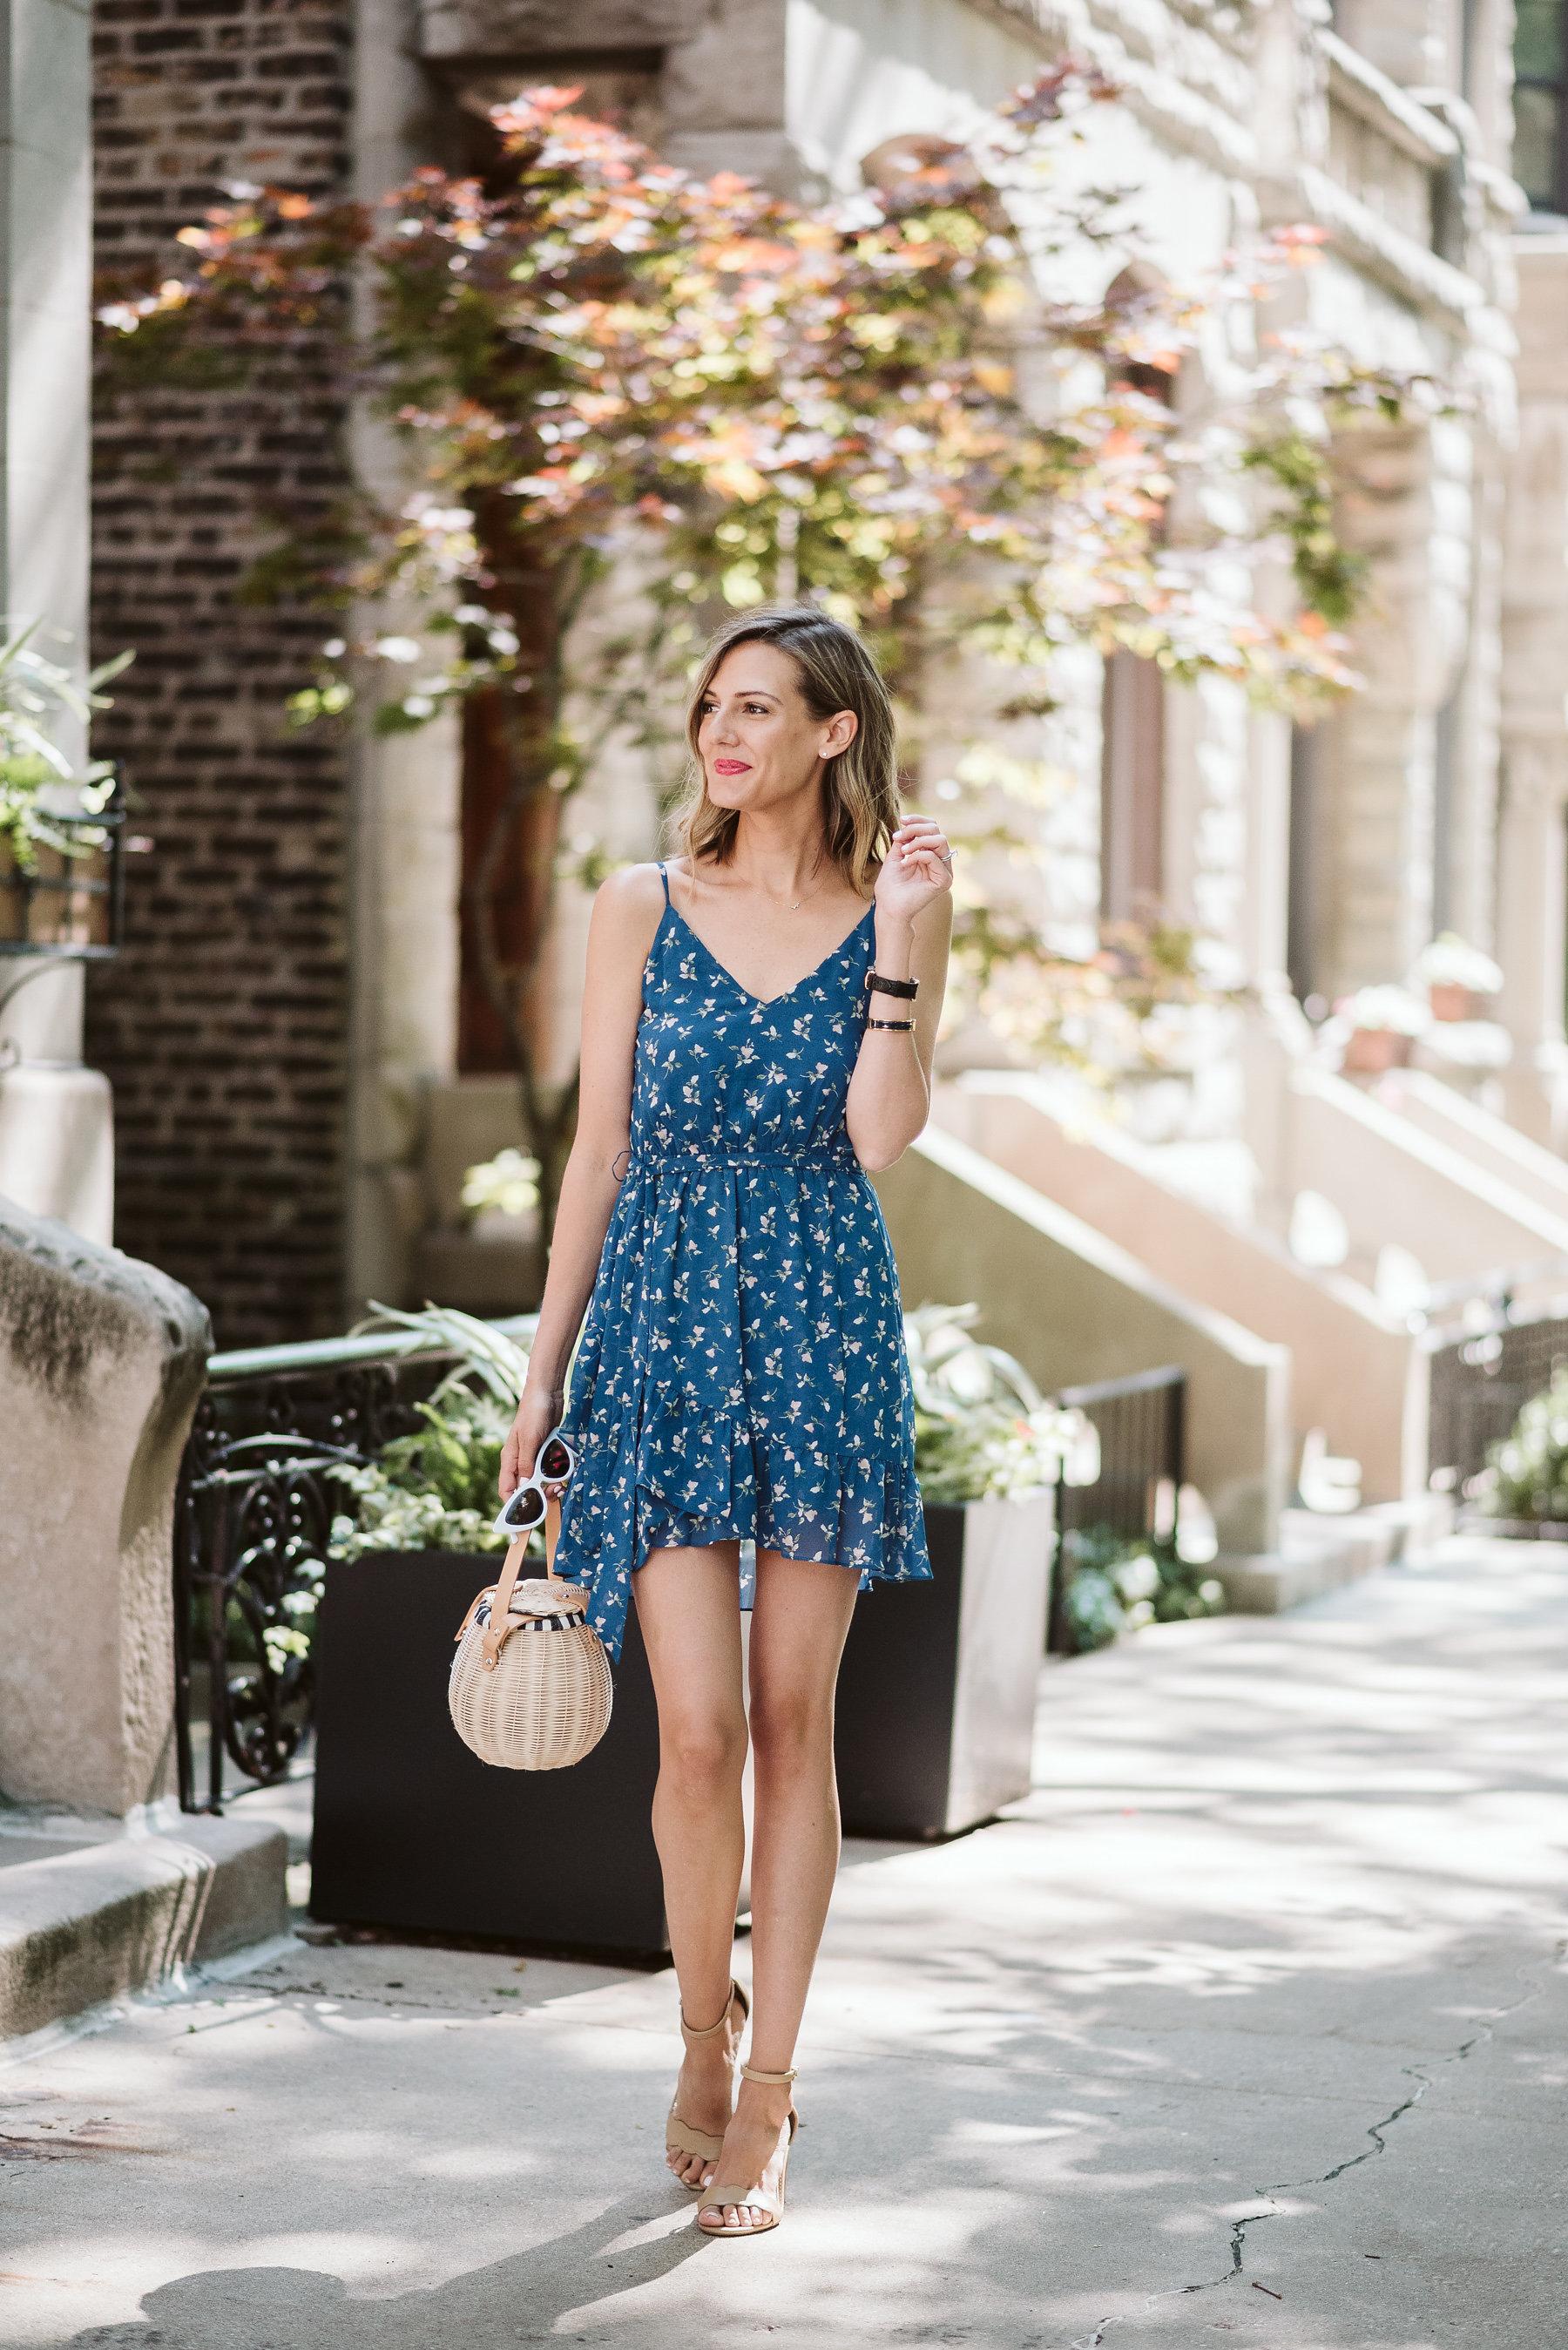 mini dresses after 30 years old aqua bloomingdales